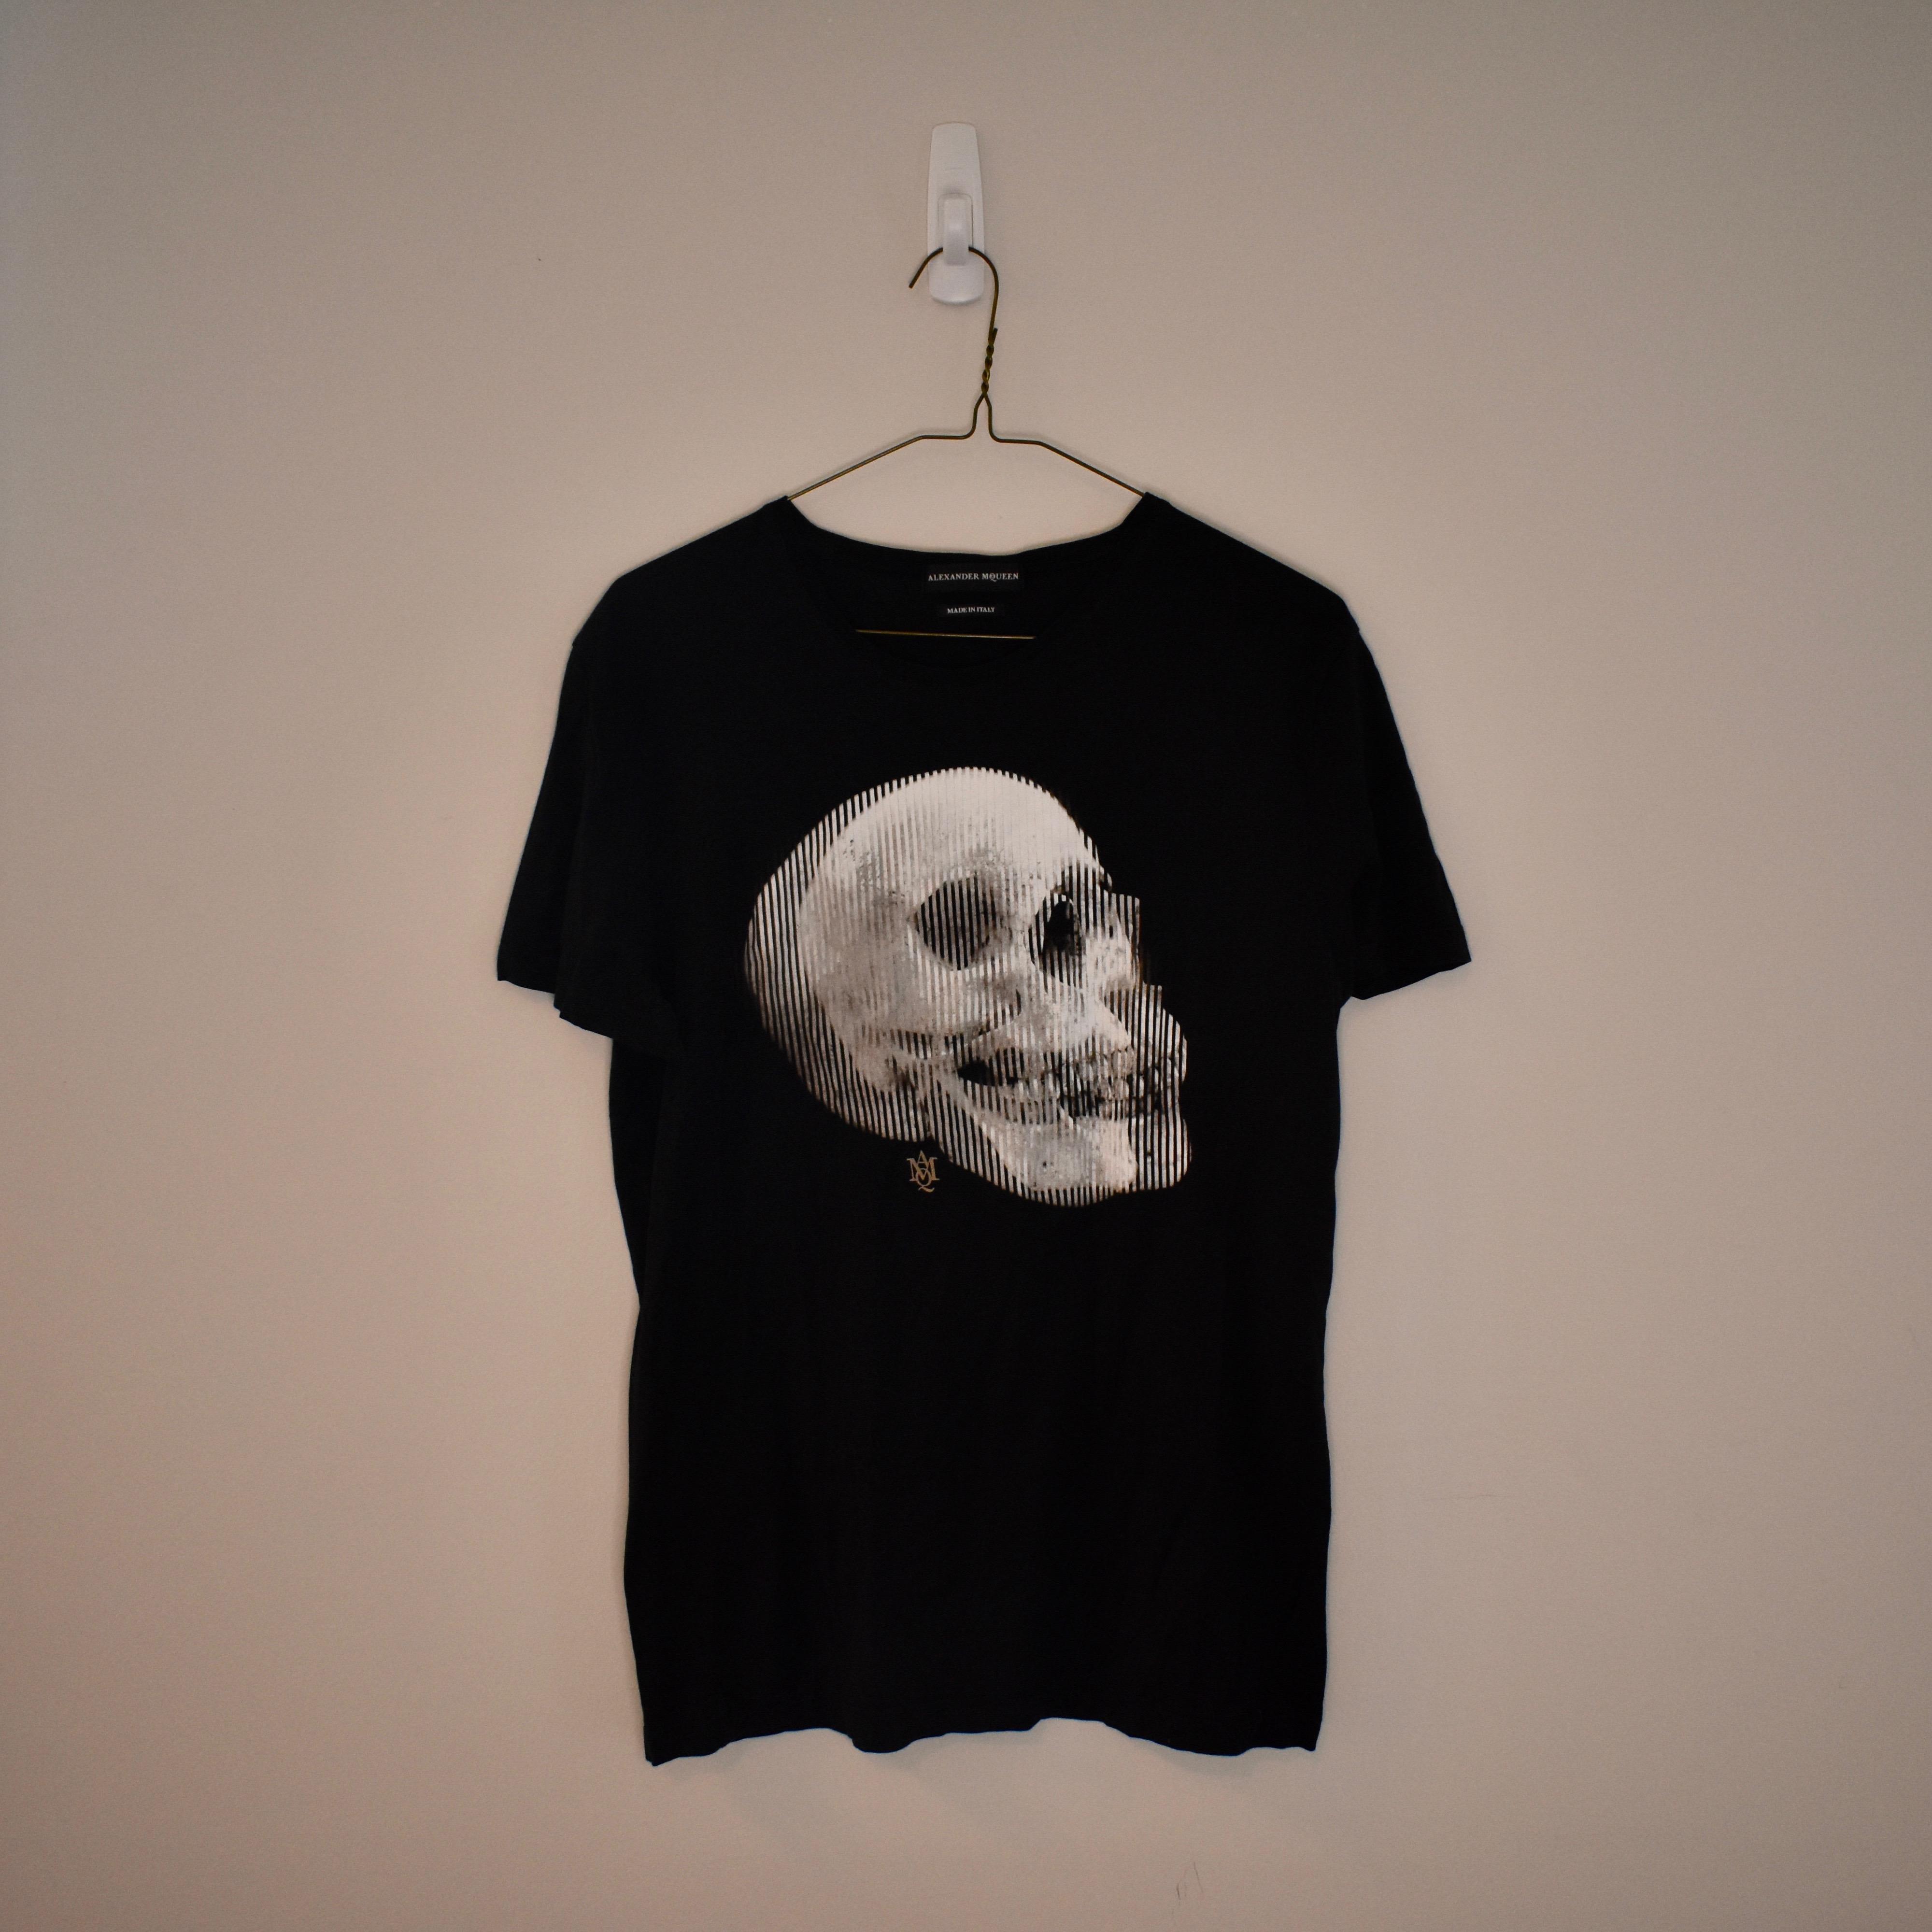 c808e4c2 Alexander Mcqueen Alexander Mcqueen Black Skull T-shirt | Grailed